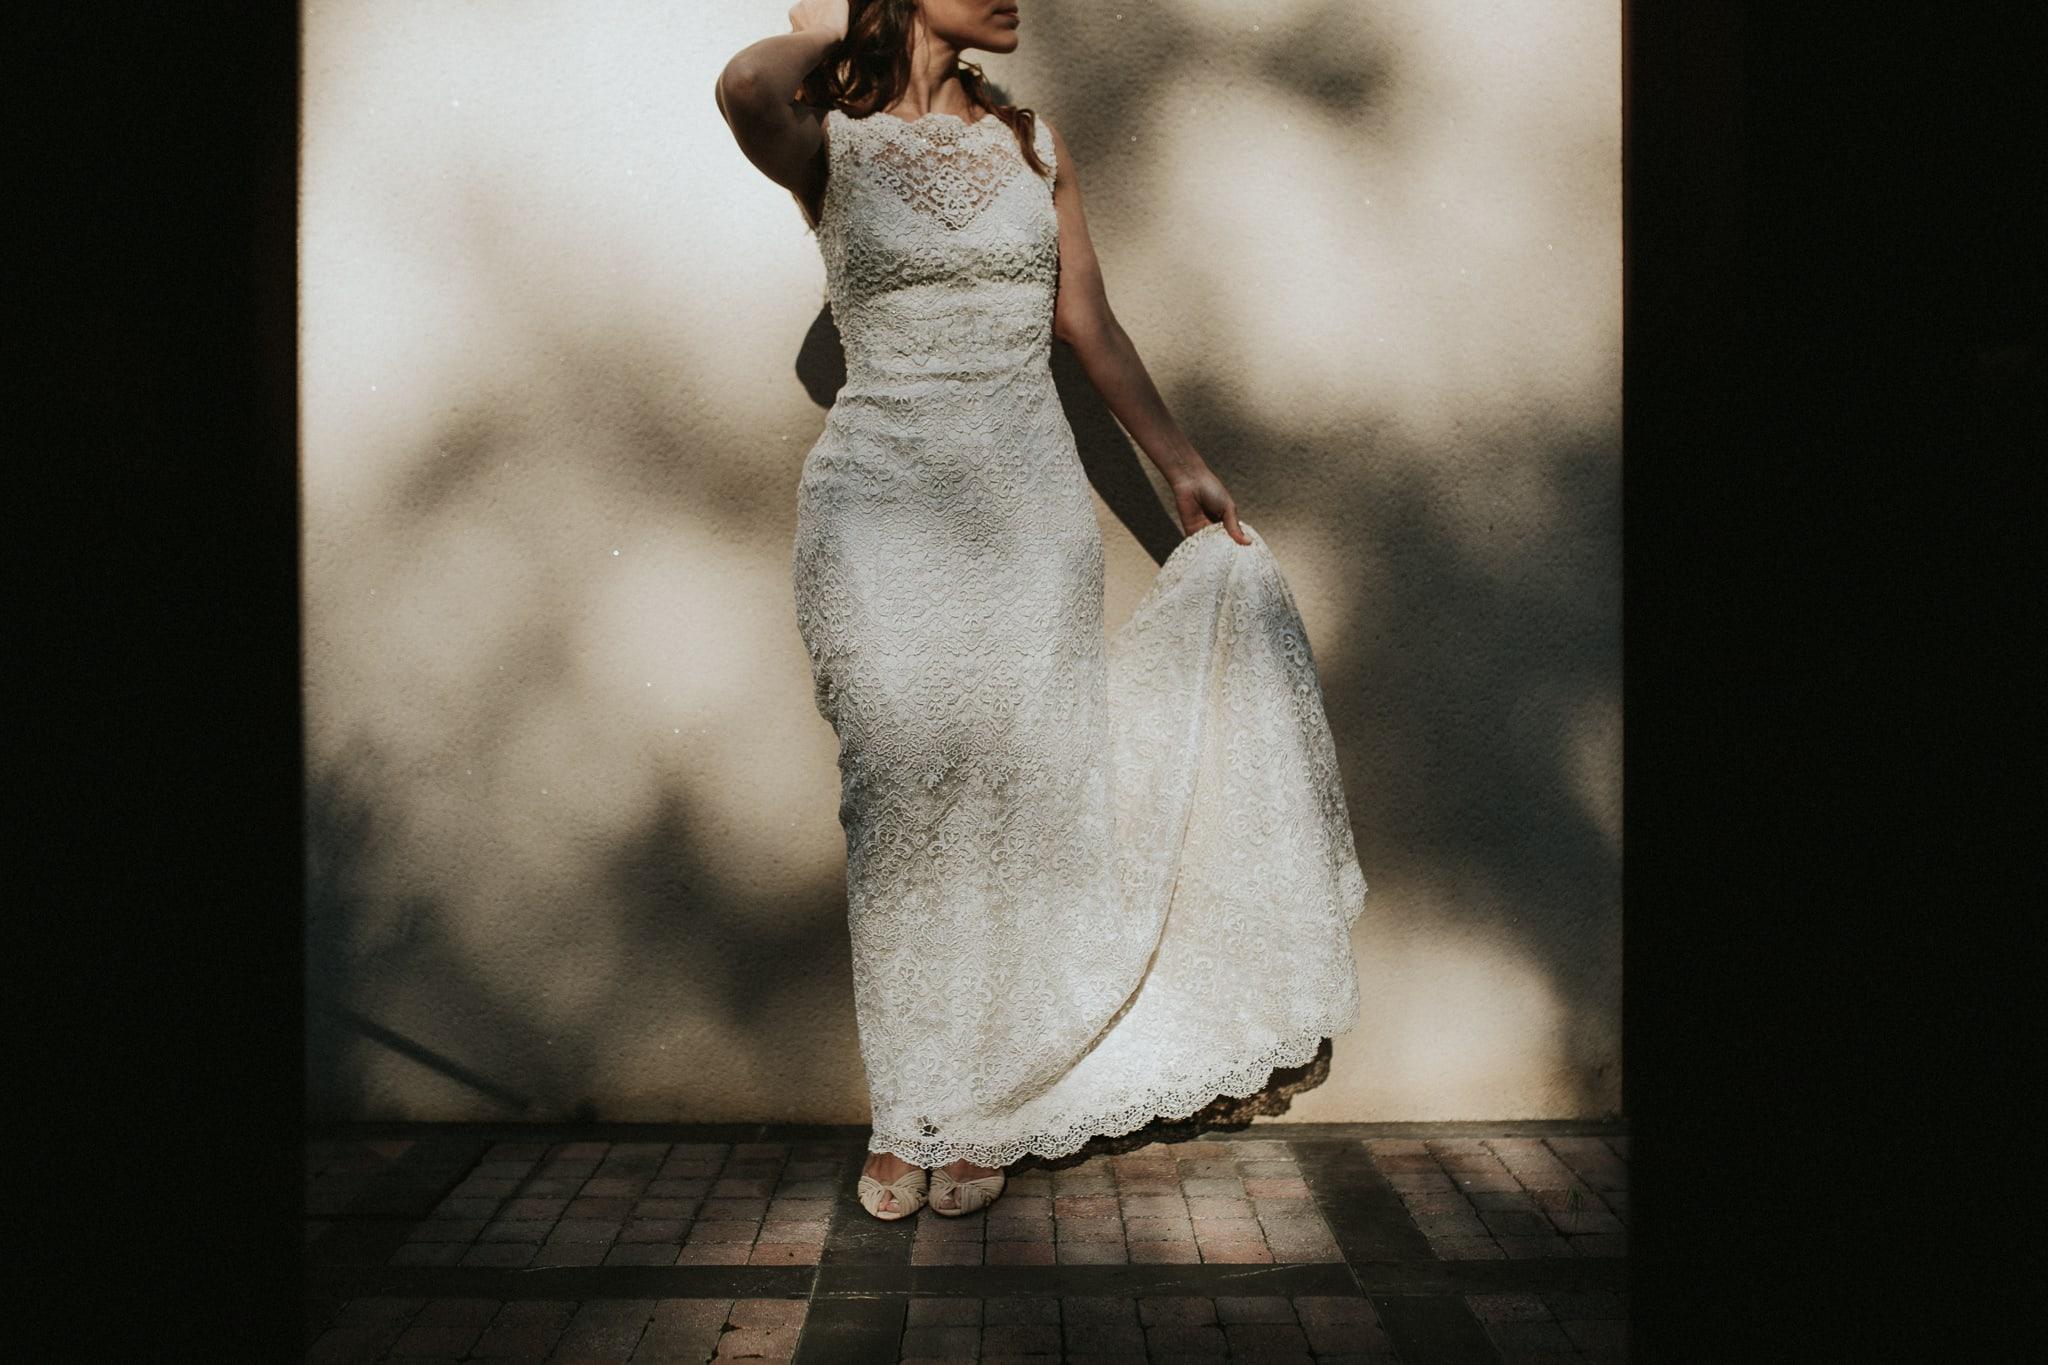 Fotografo-bodas-Cigarral-de-las-Mercedes-59